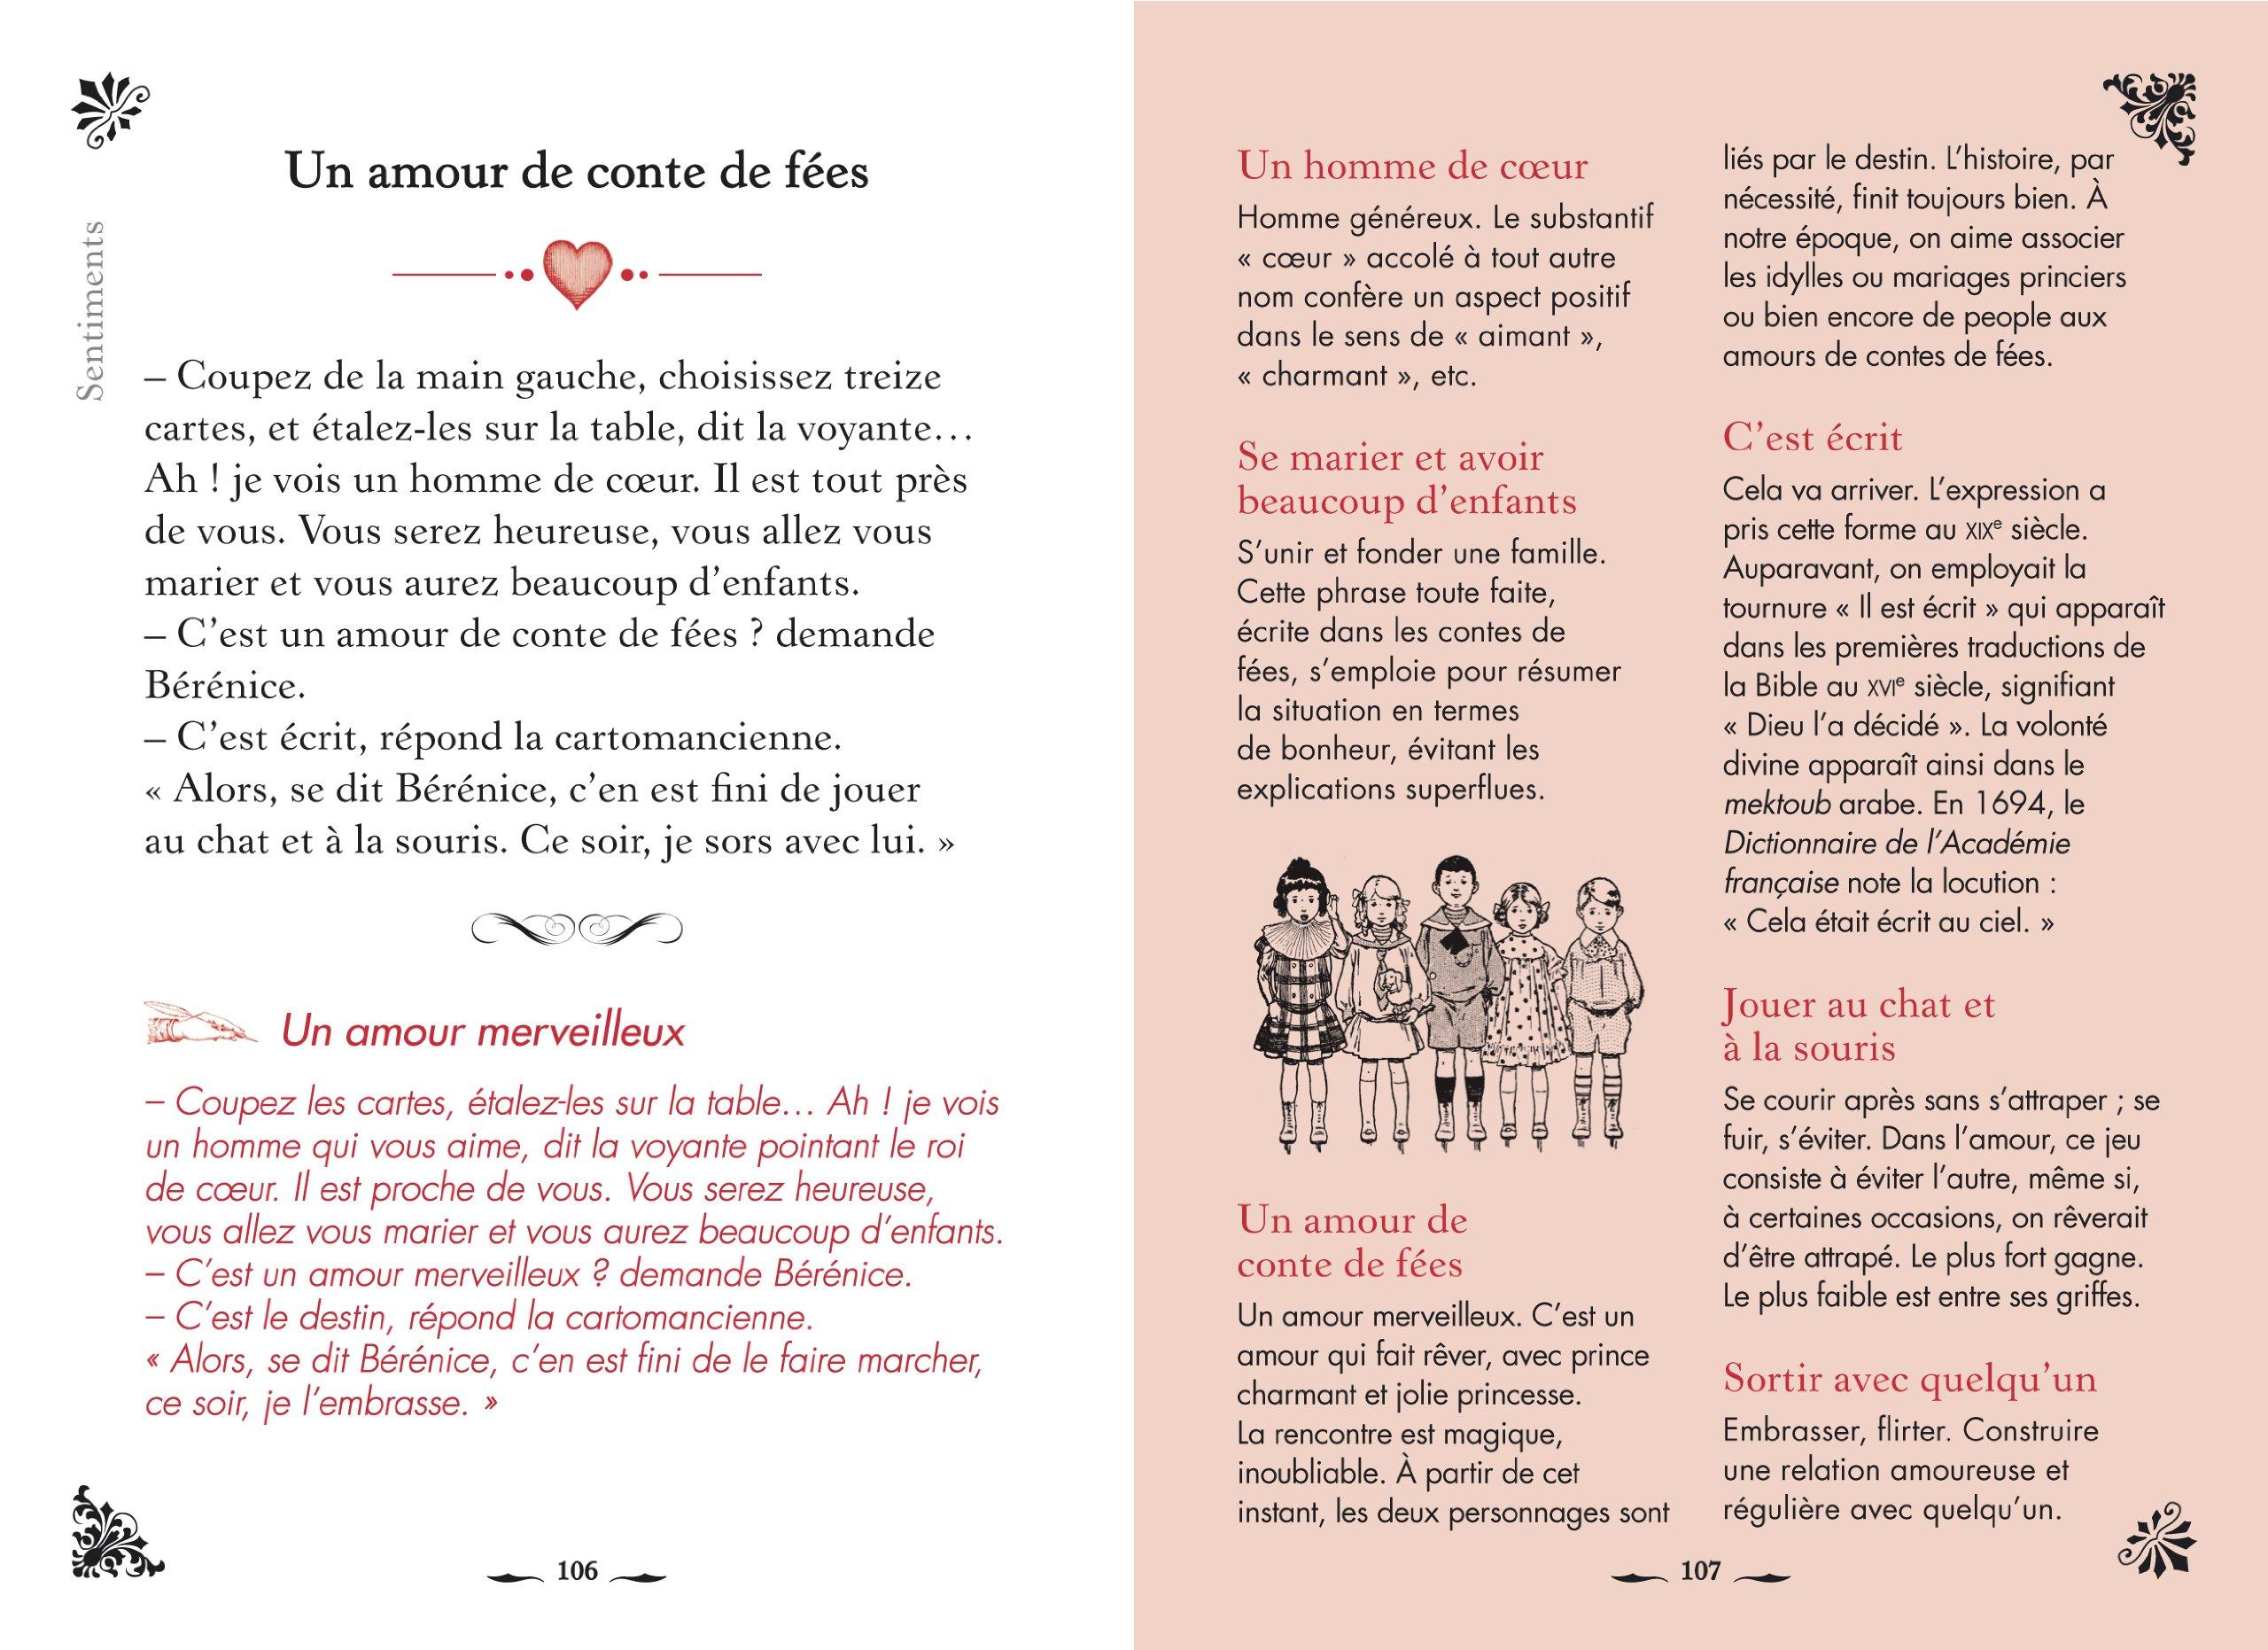 traduire flirter en arabe rencontre des filles a ouaga